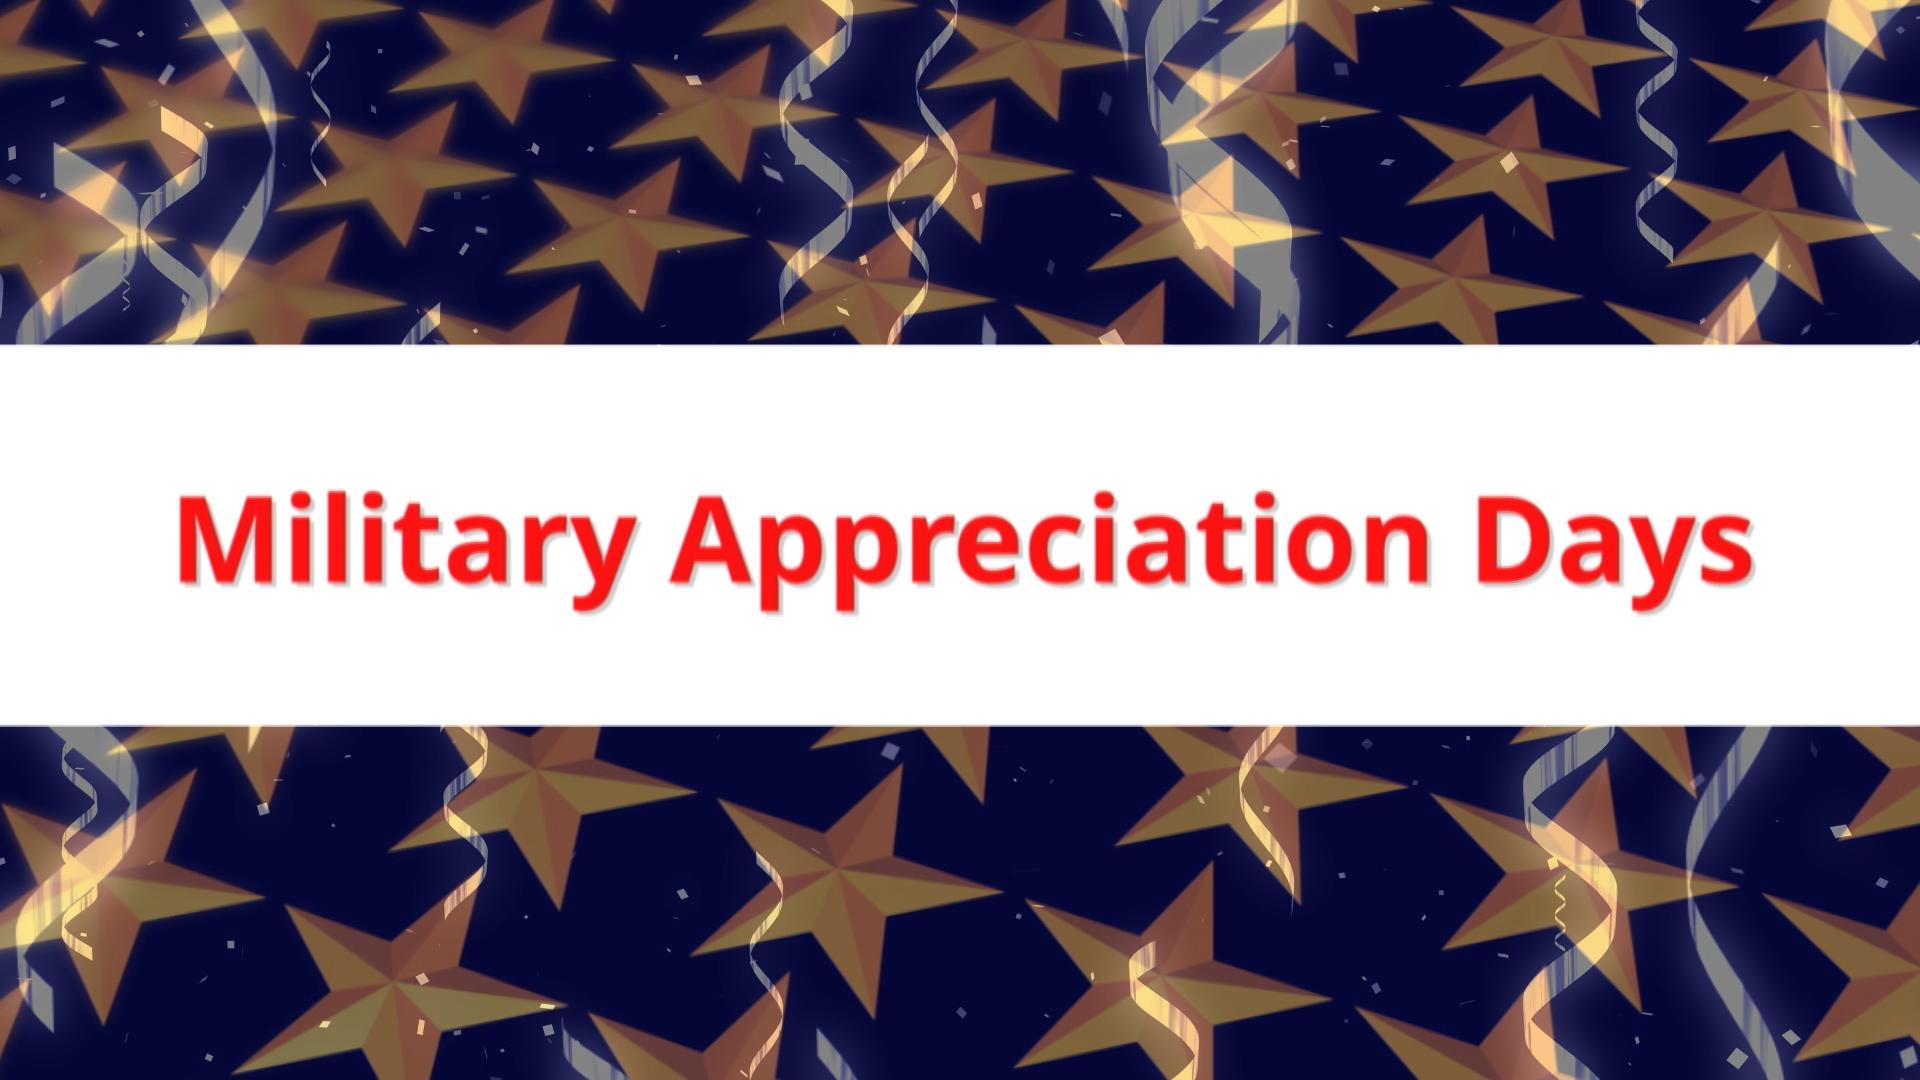 Military Appreciation Days THUMBNAIL